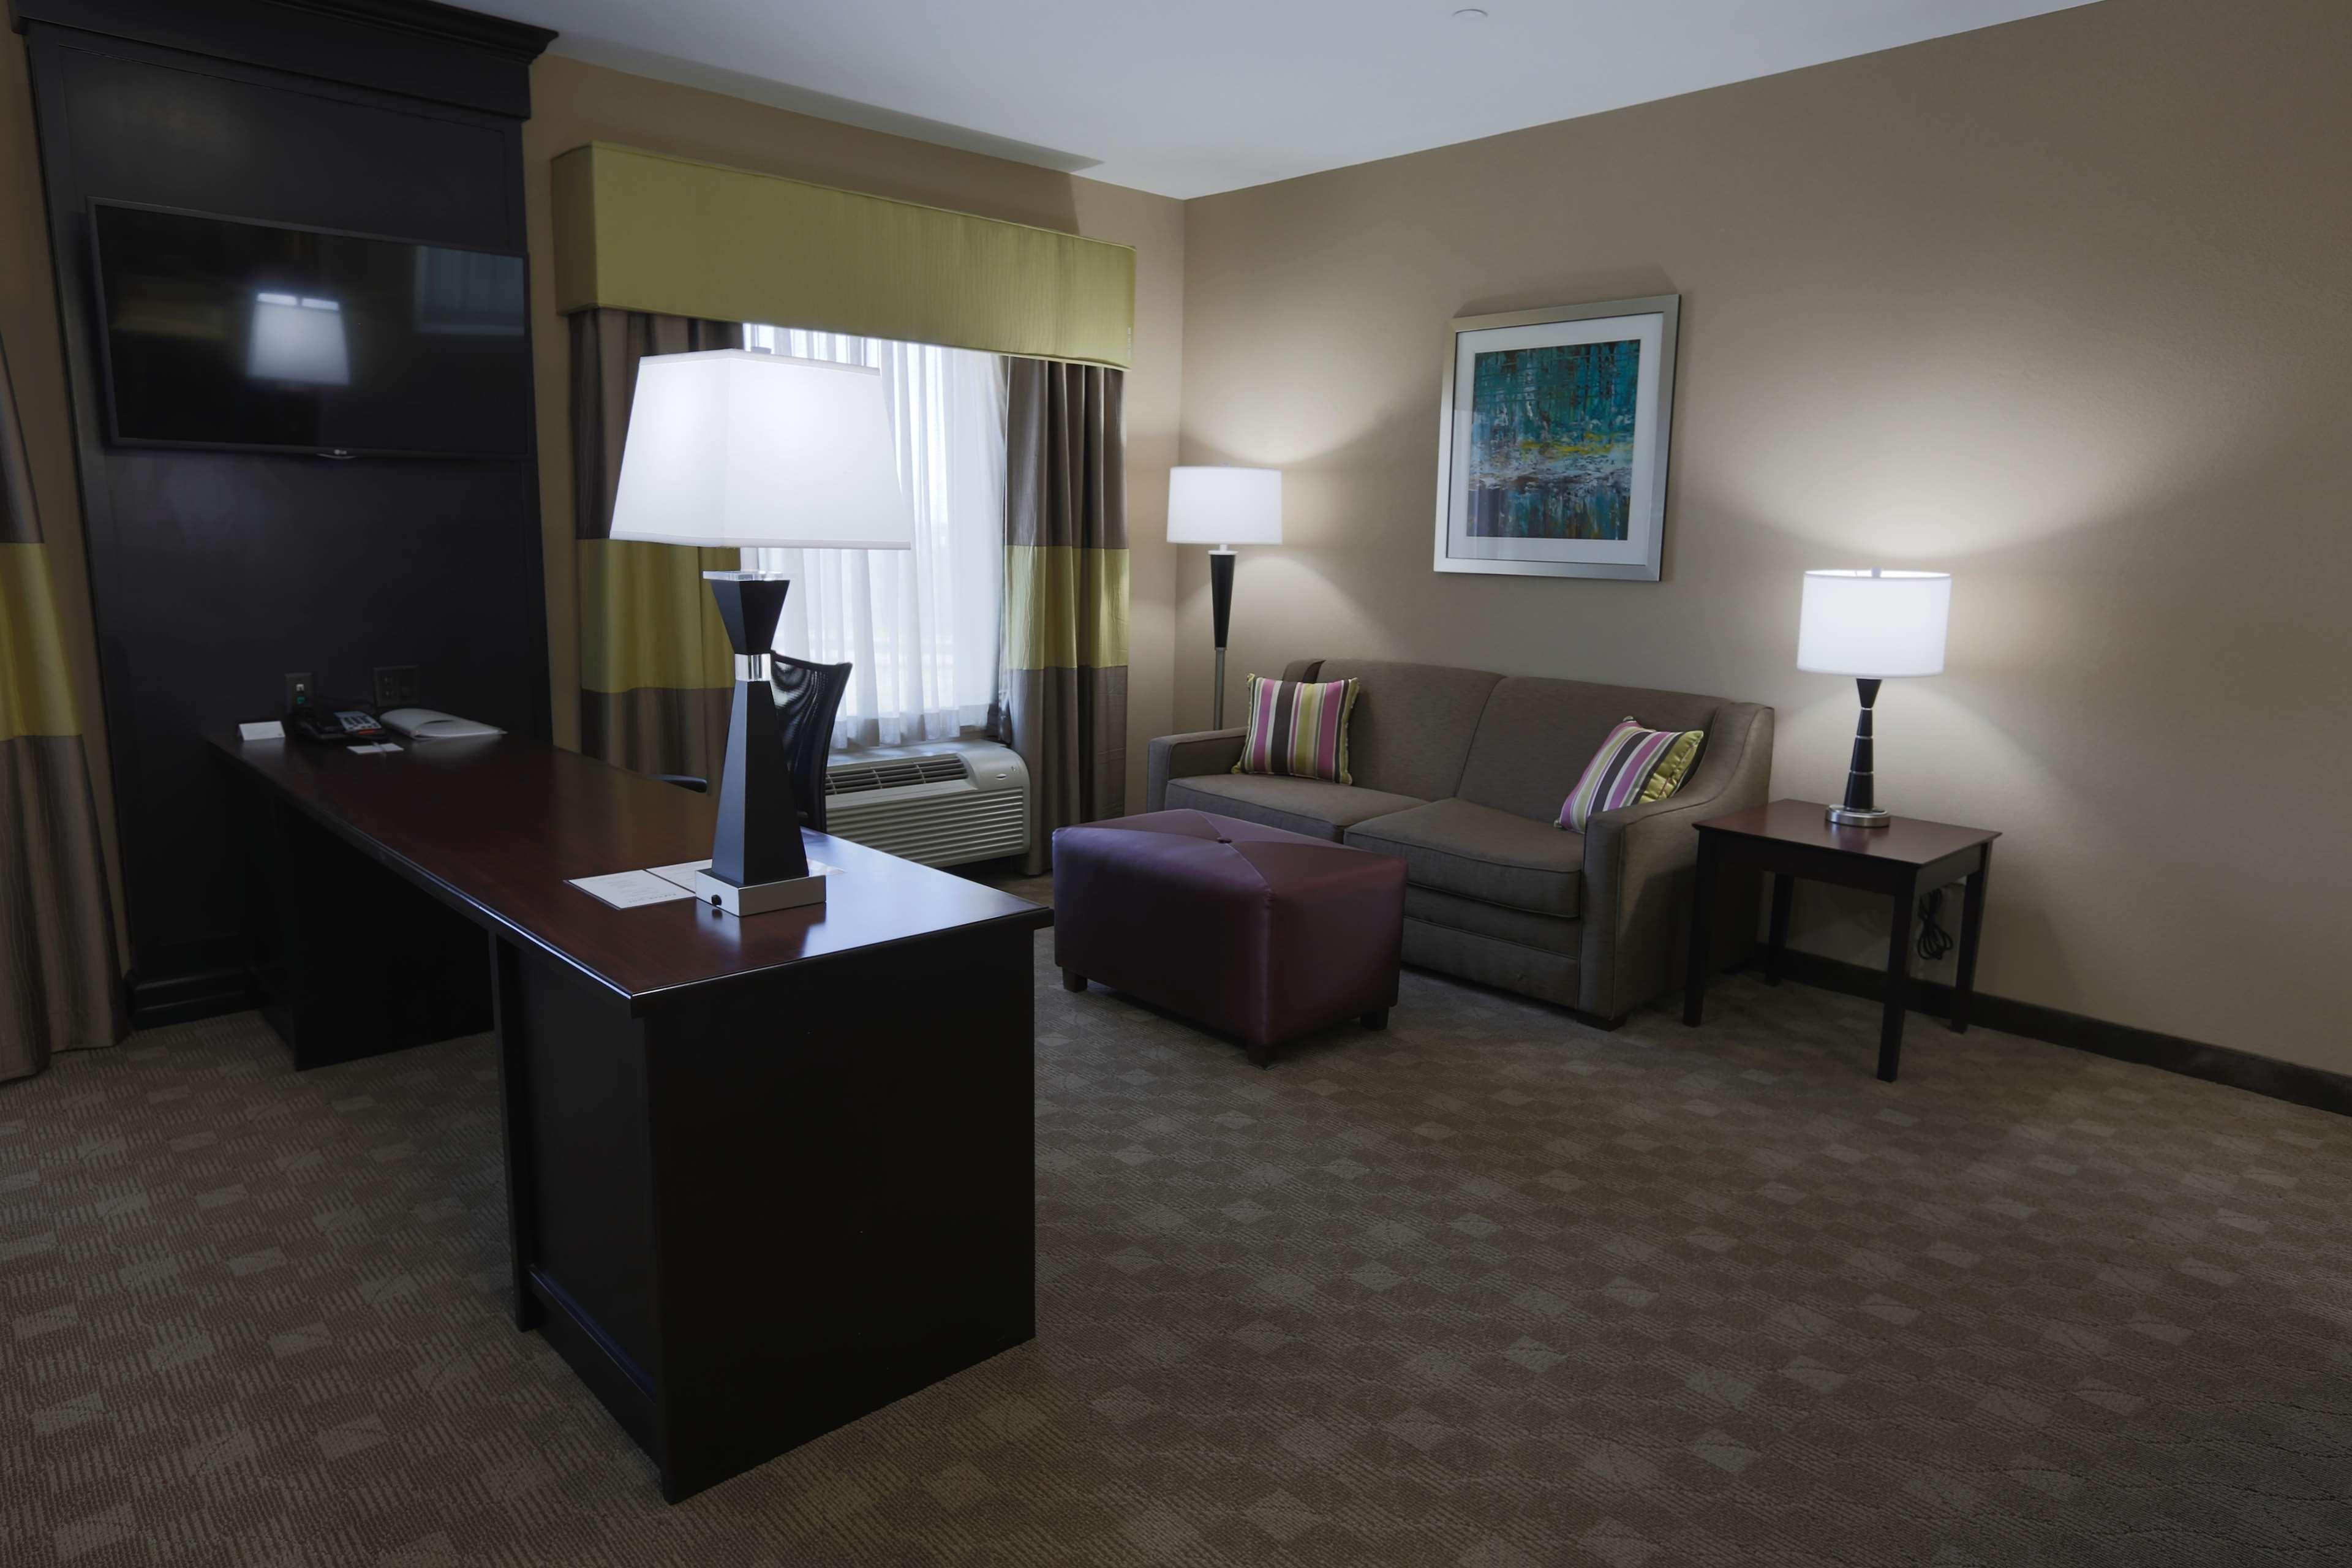 Hampton Inn & Suites Missouri City, TX image 33